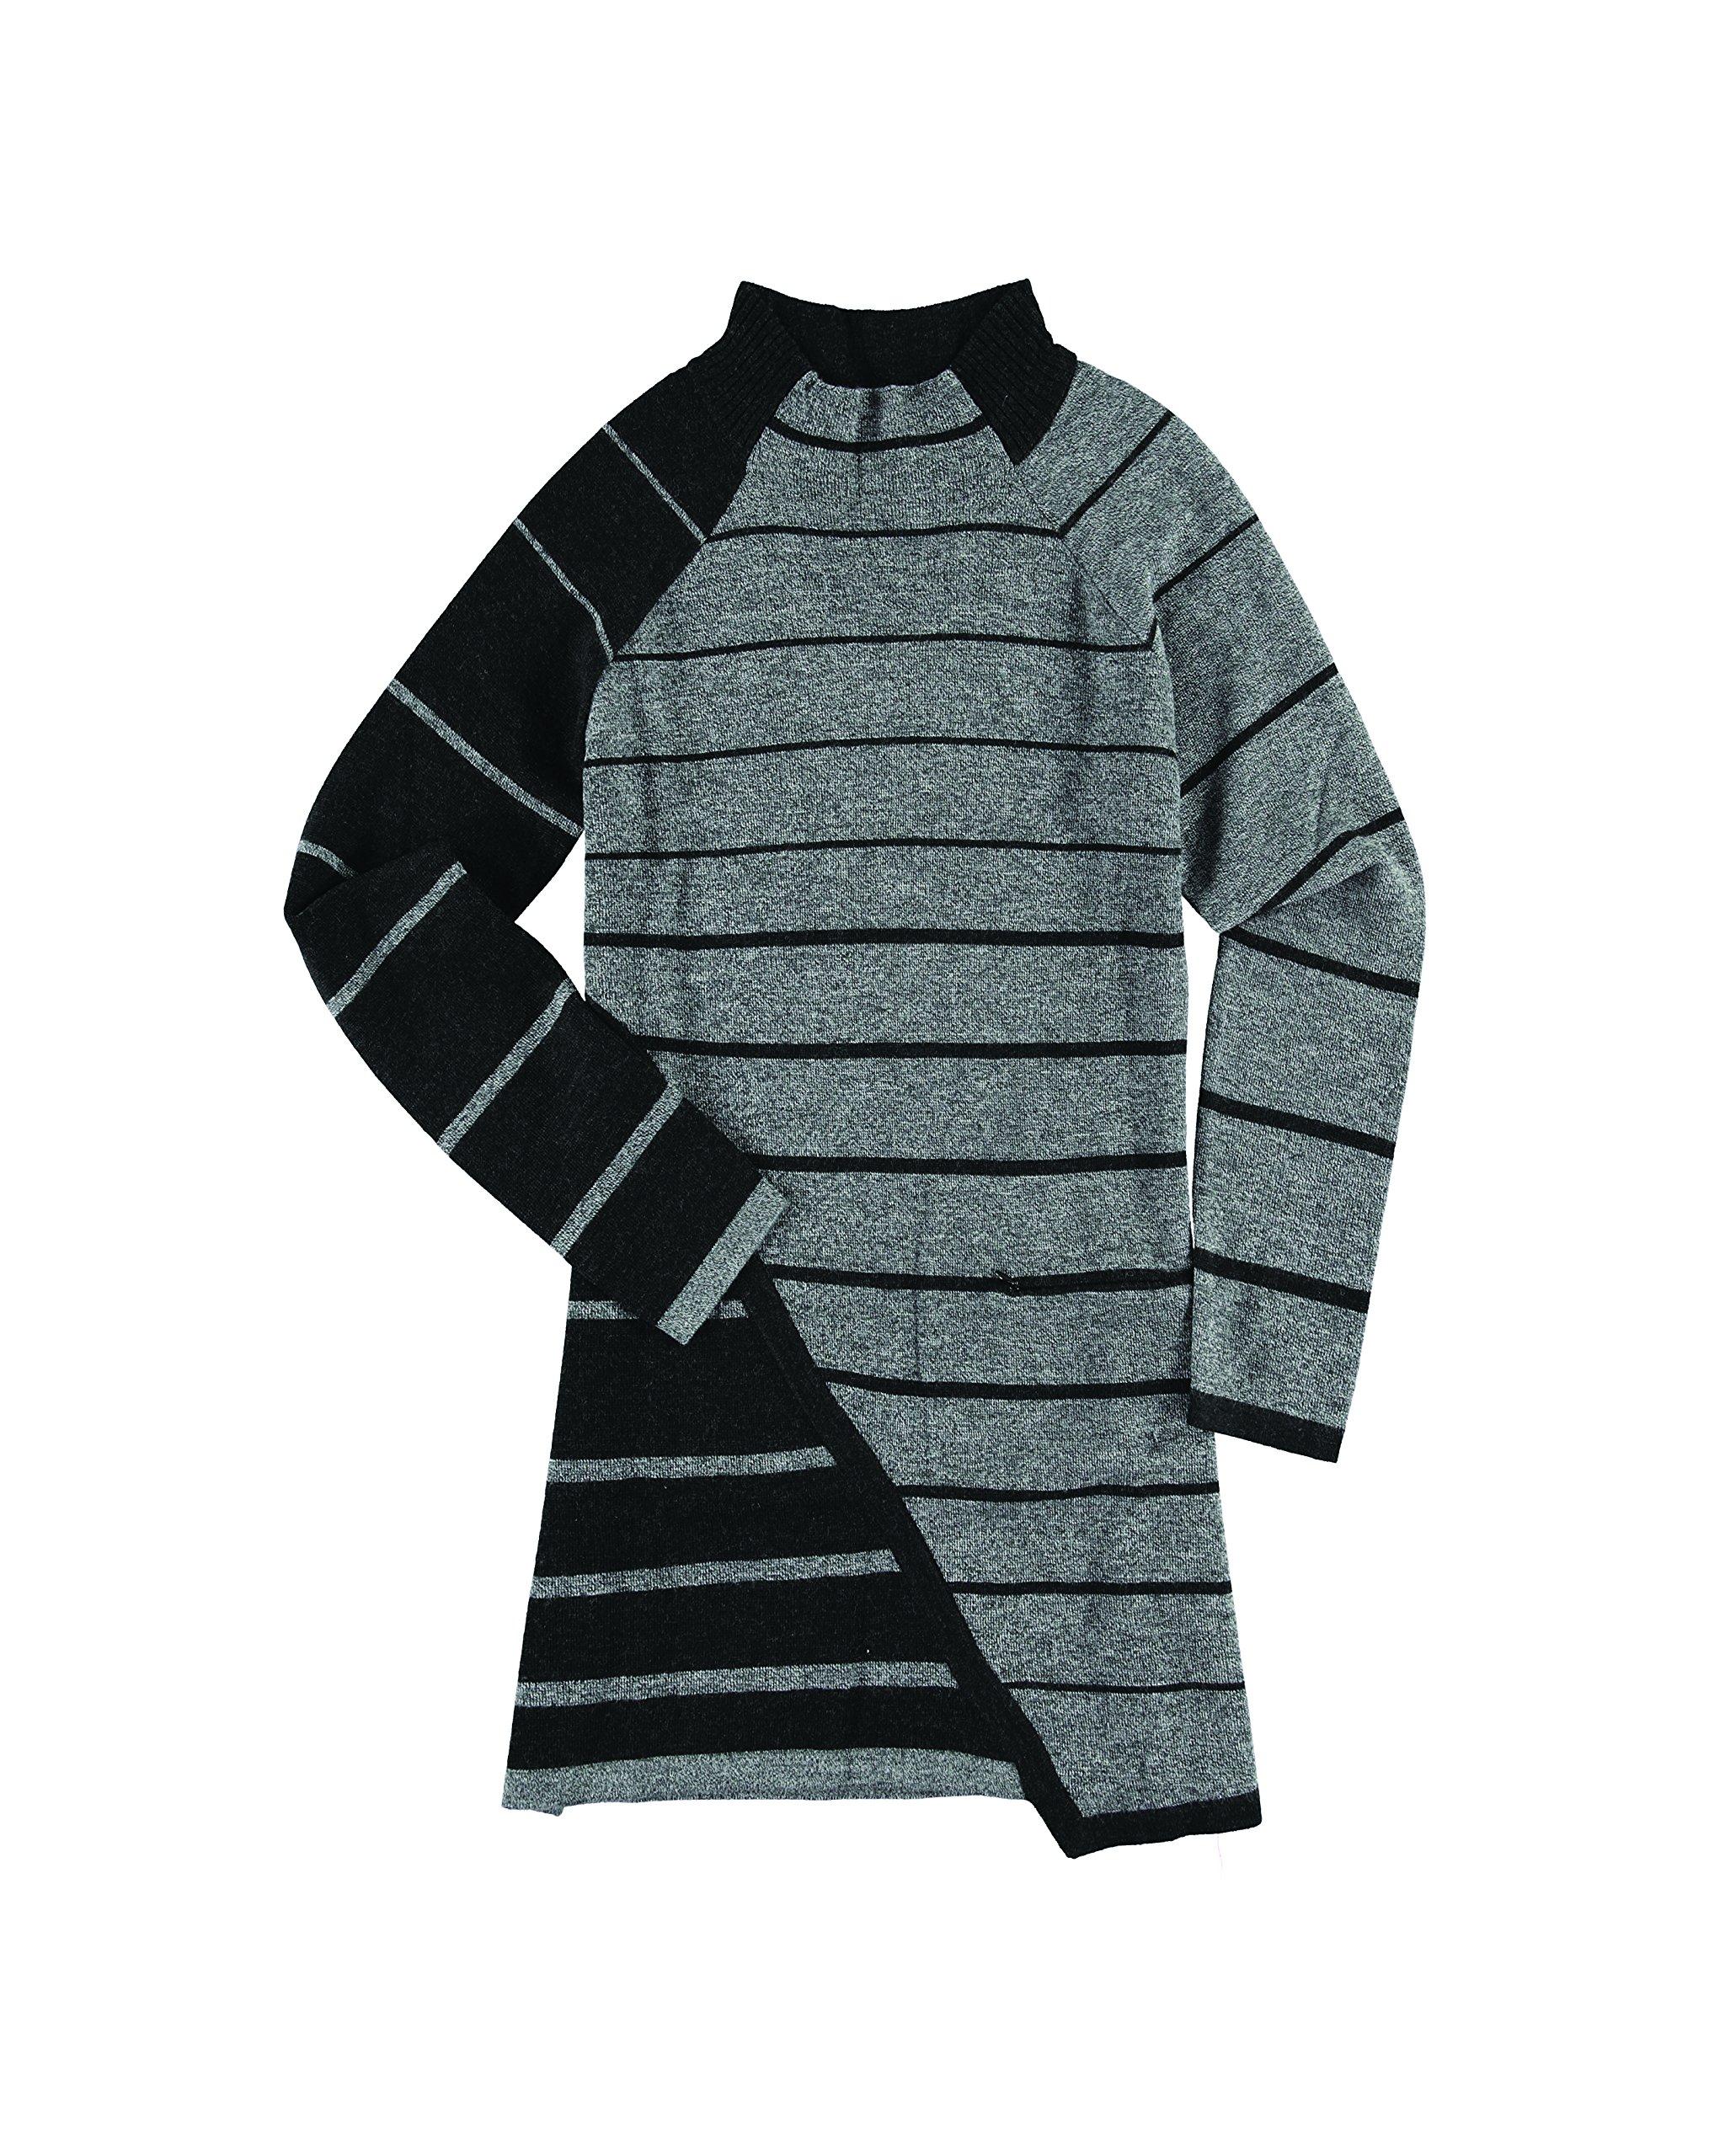 Krimson Klover Penelope Asymmetrical Striped Tunic - ( Heather Black, X-Small ) by Krimson Klover